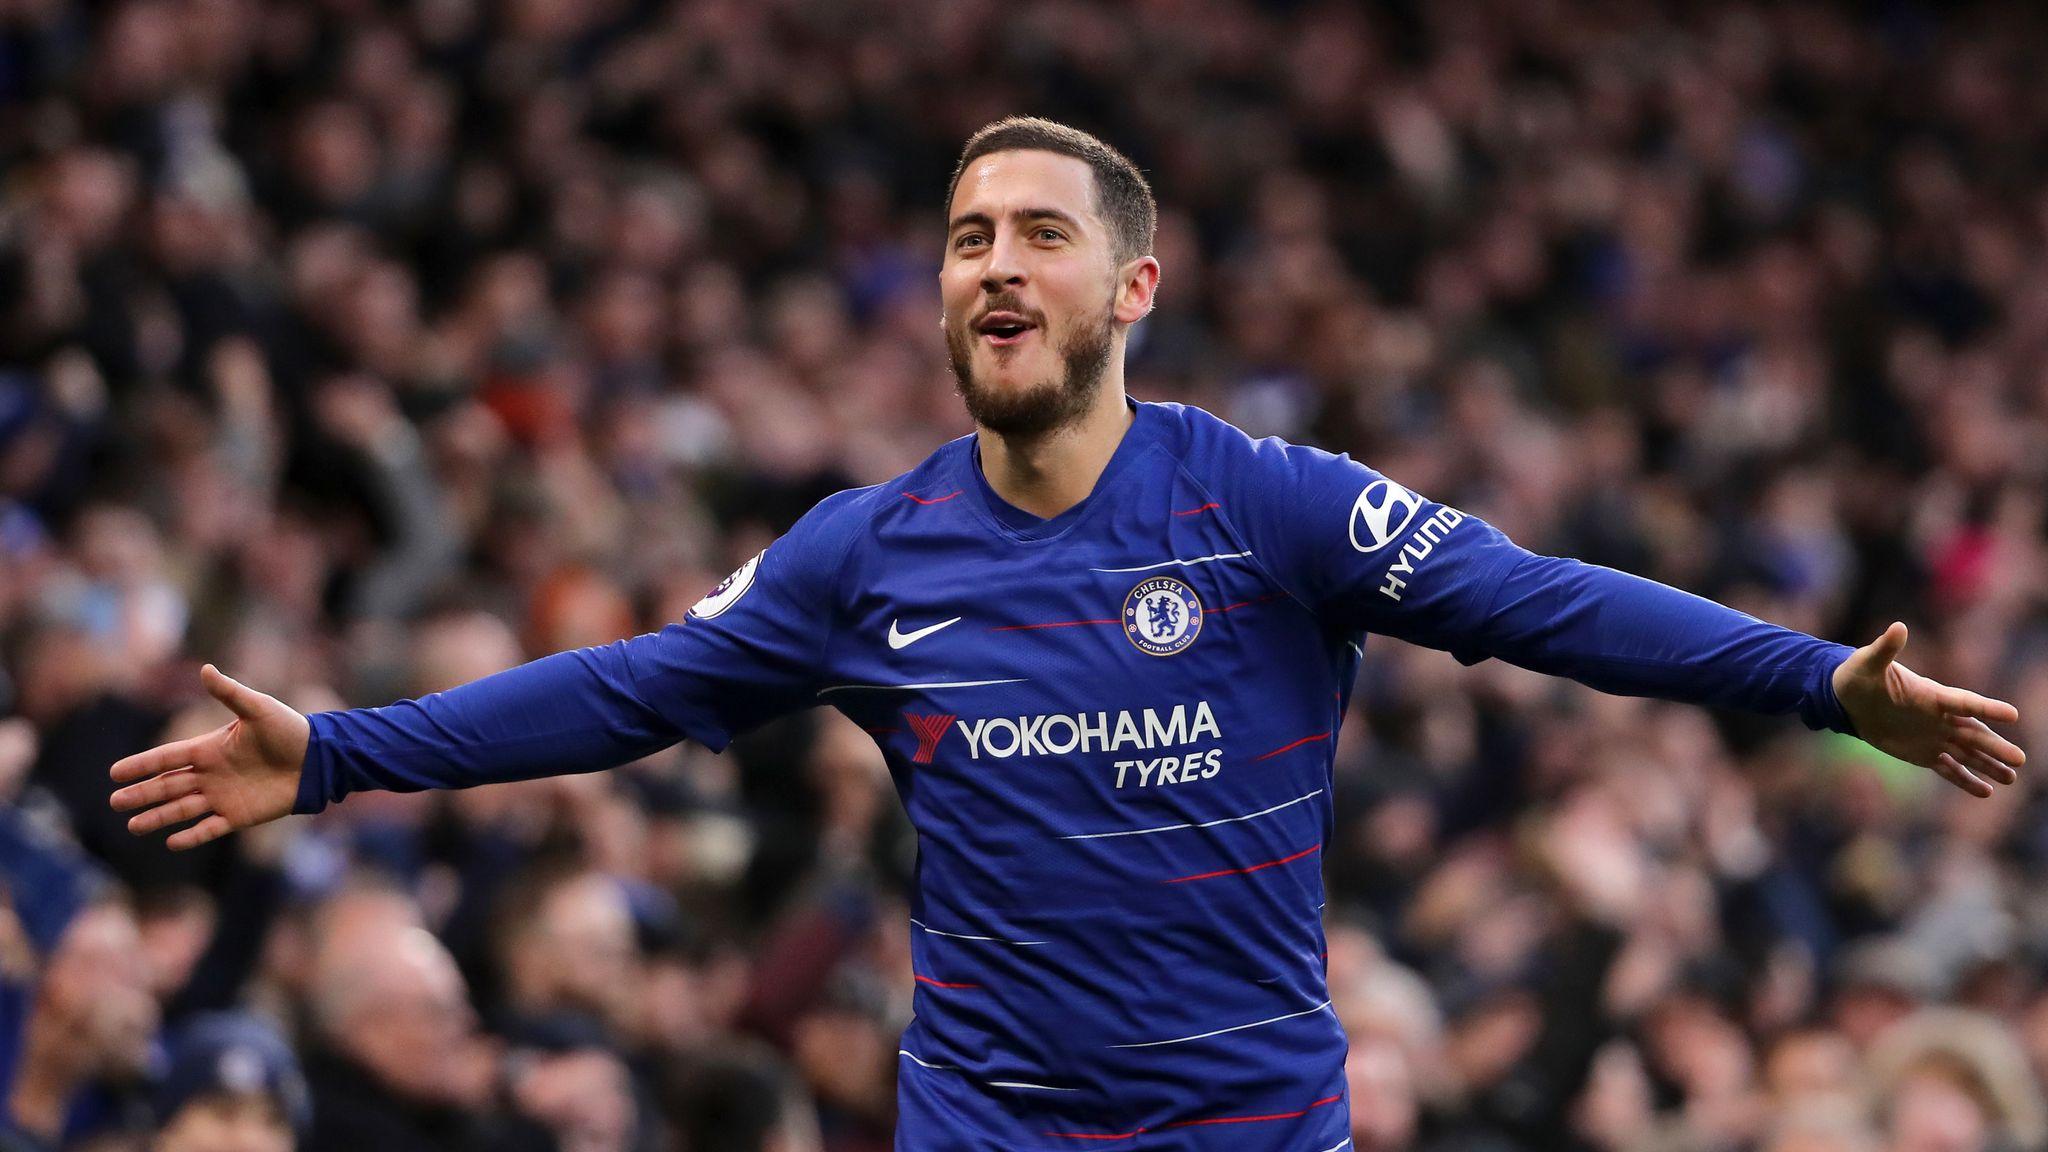 Chelsea want £130m for Eden Hazard | Football News | Sky Sports